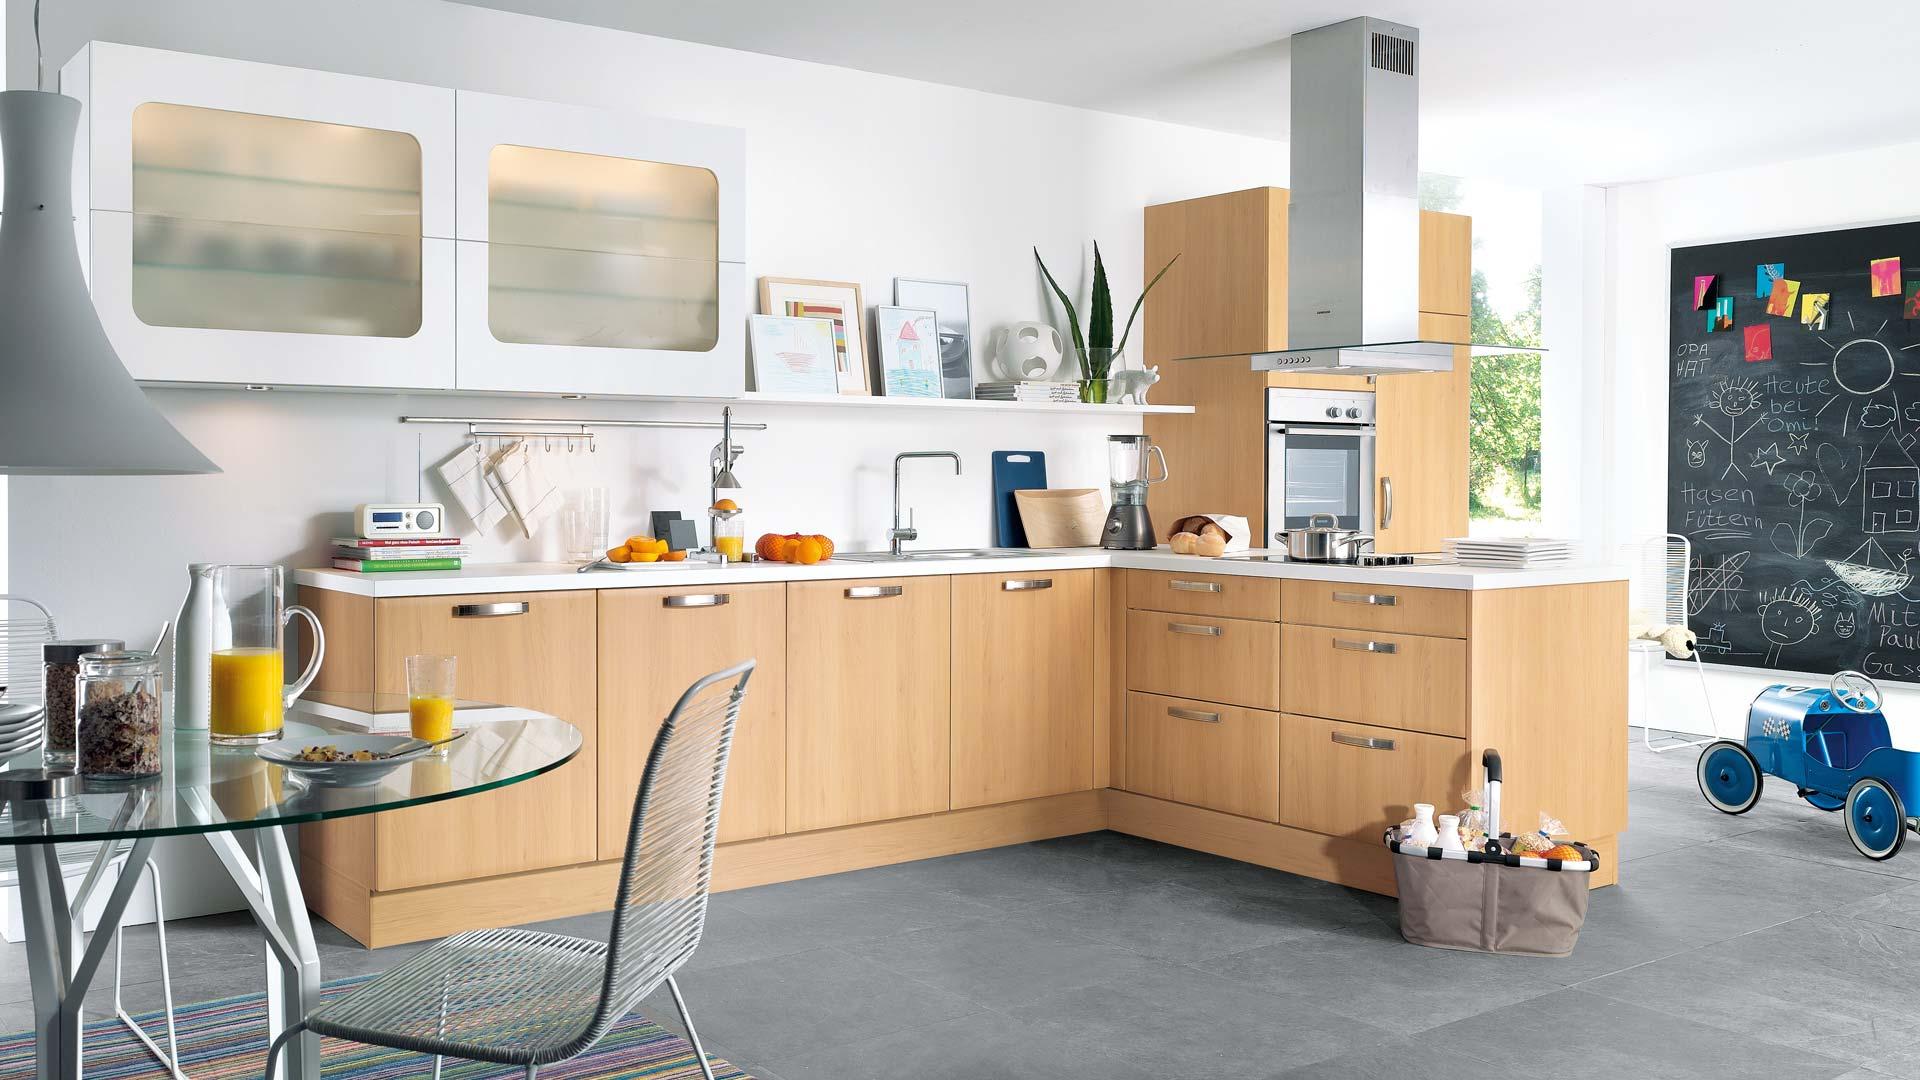 k chen m nchen schwabing. Black Bedroom Furniture Sets. Home Design Ideas